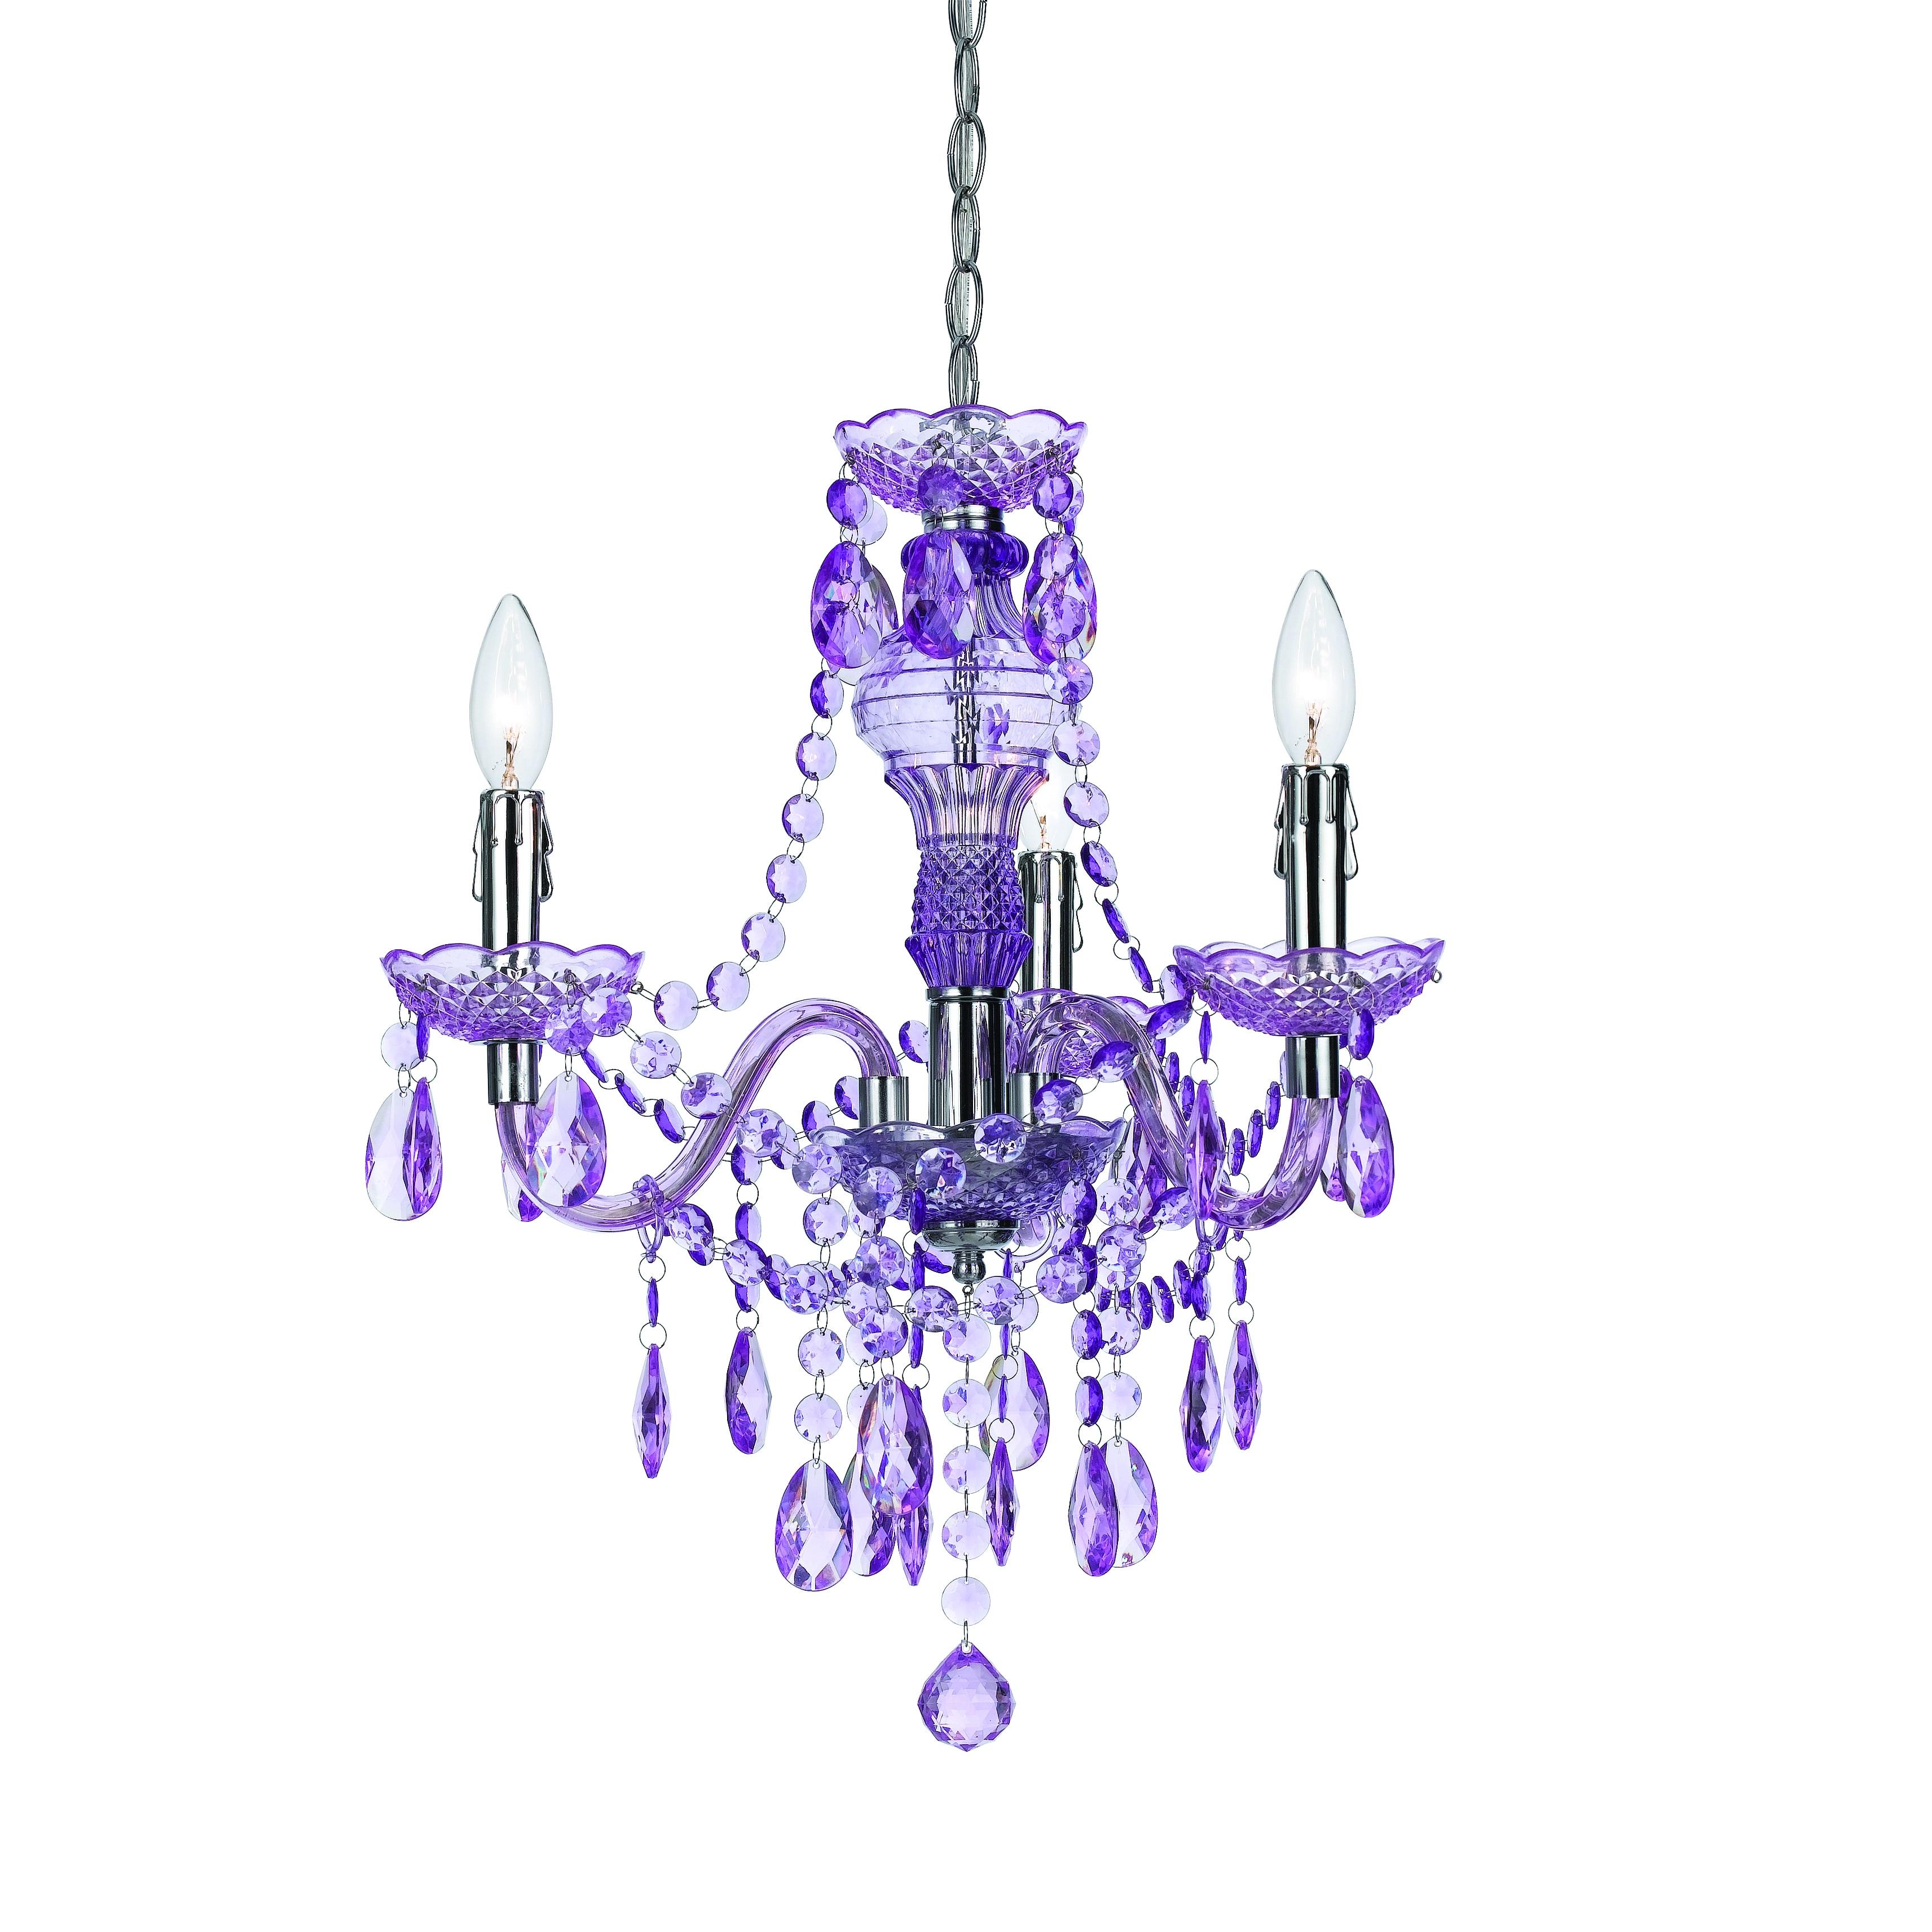 Af Lighting angelo:Home Purple Faux Crystal 3-light/ 5-li...